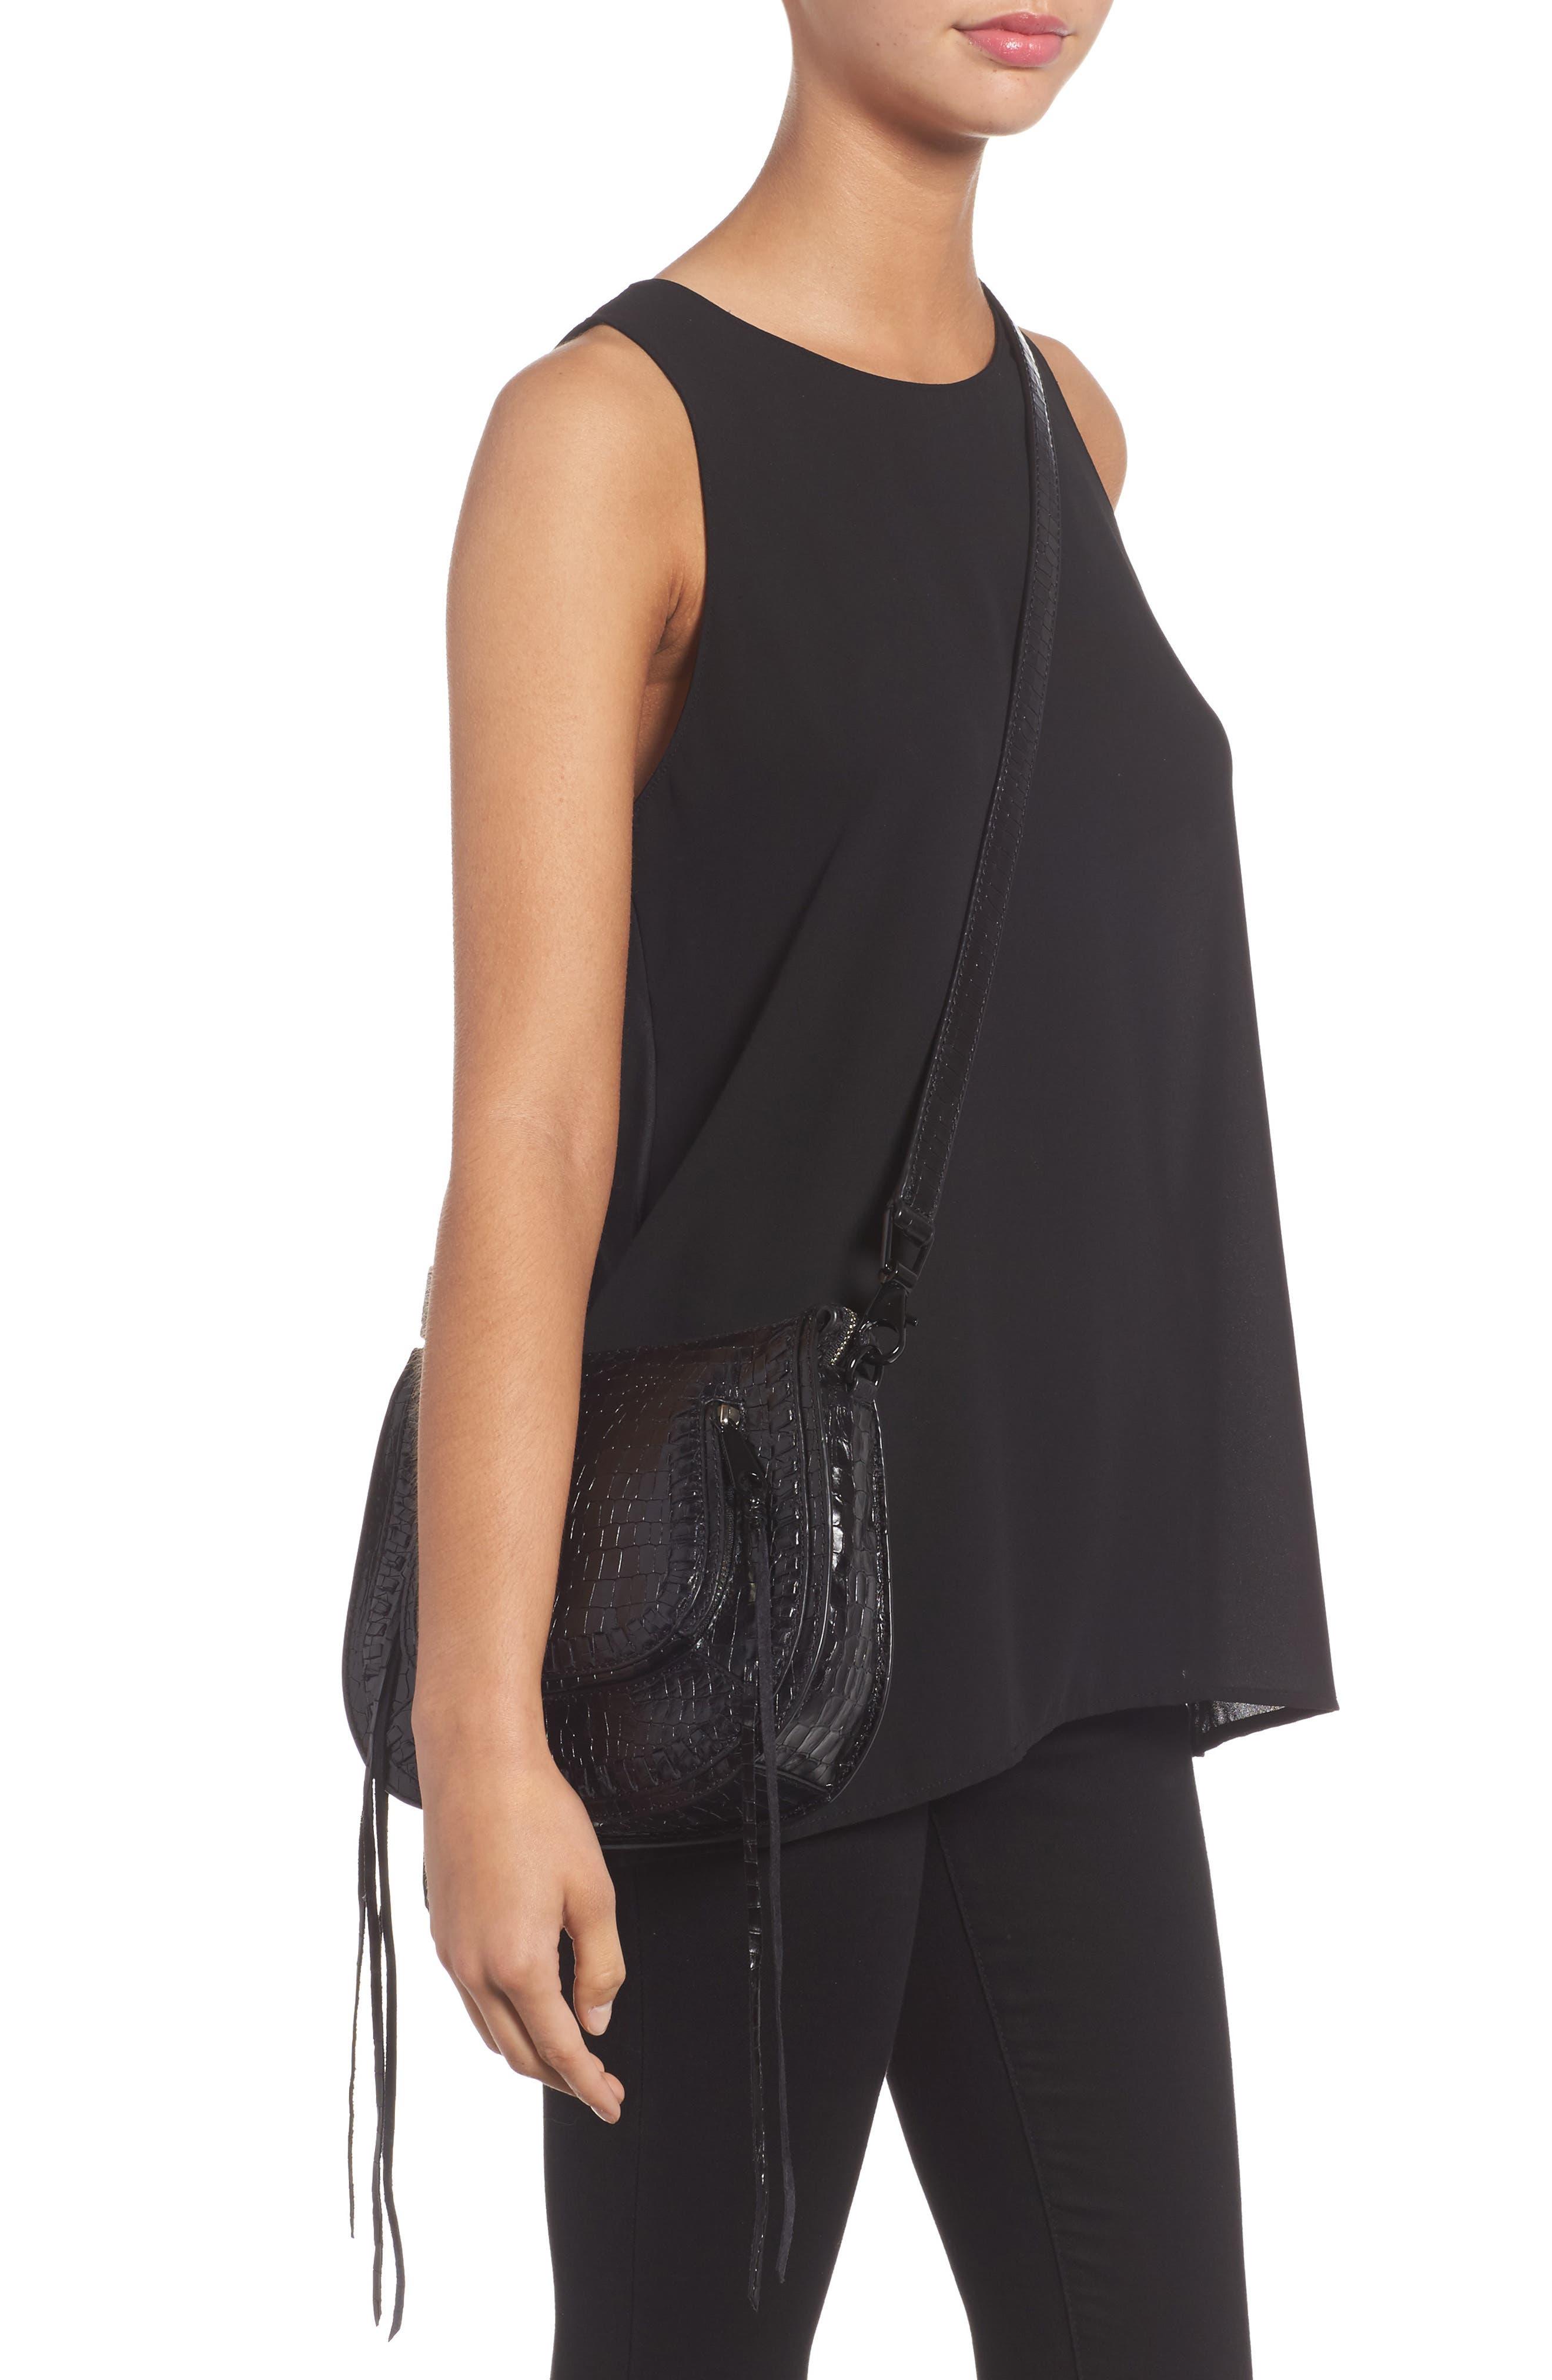 Vanity Croc-Embossed Leather Saddle Bag,                             Alternate thumbnail 2, color,